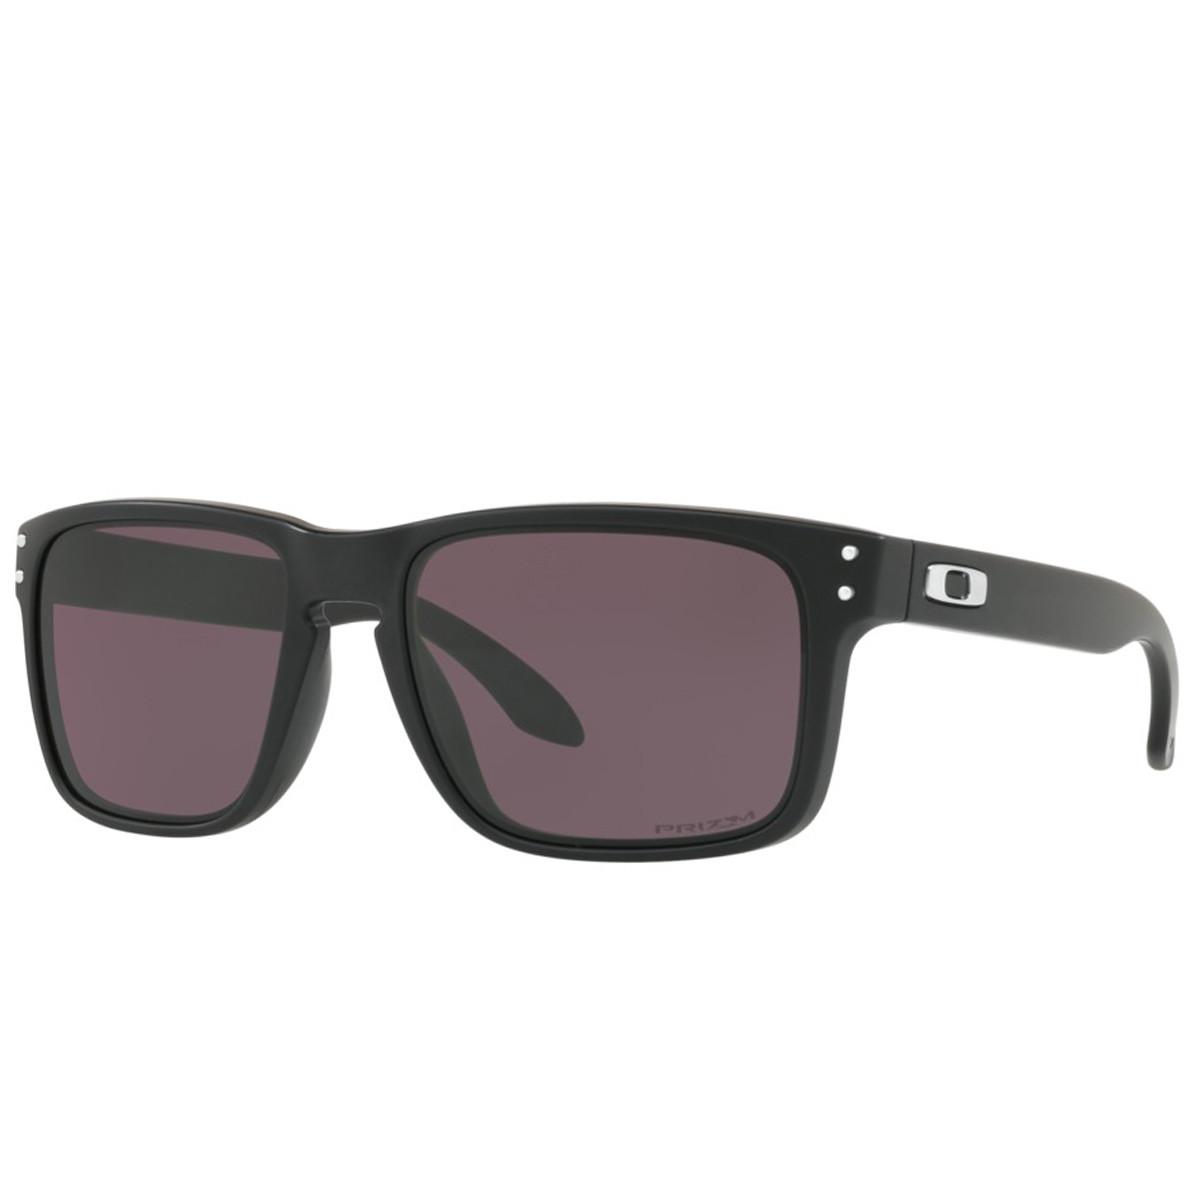 Óculos Oakley Holbrook Matte Black  Lente Prizm Grey ref OO9102-E8 85b184db6f